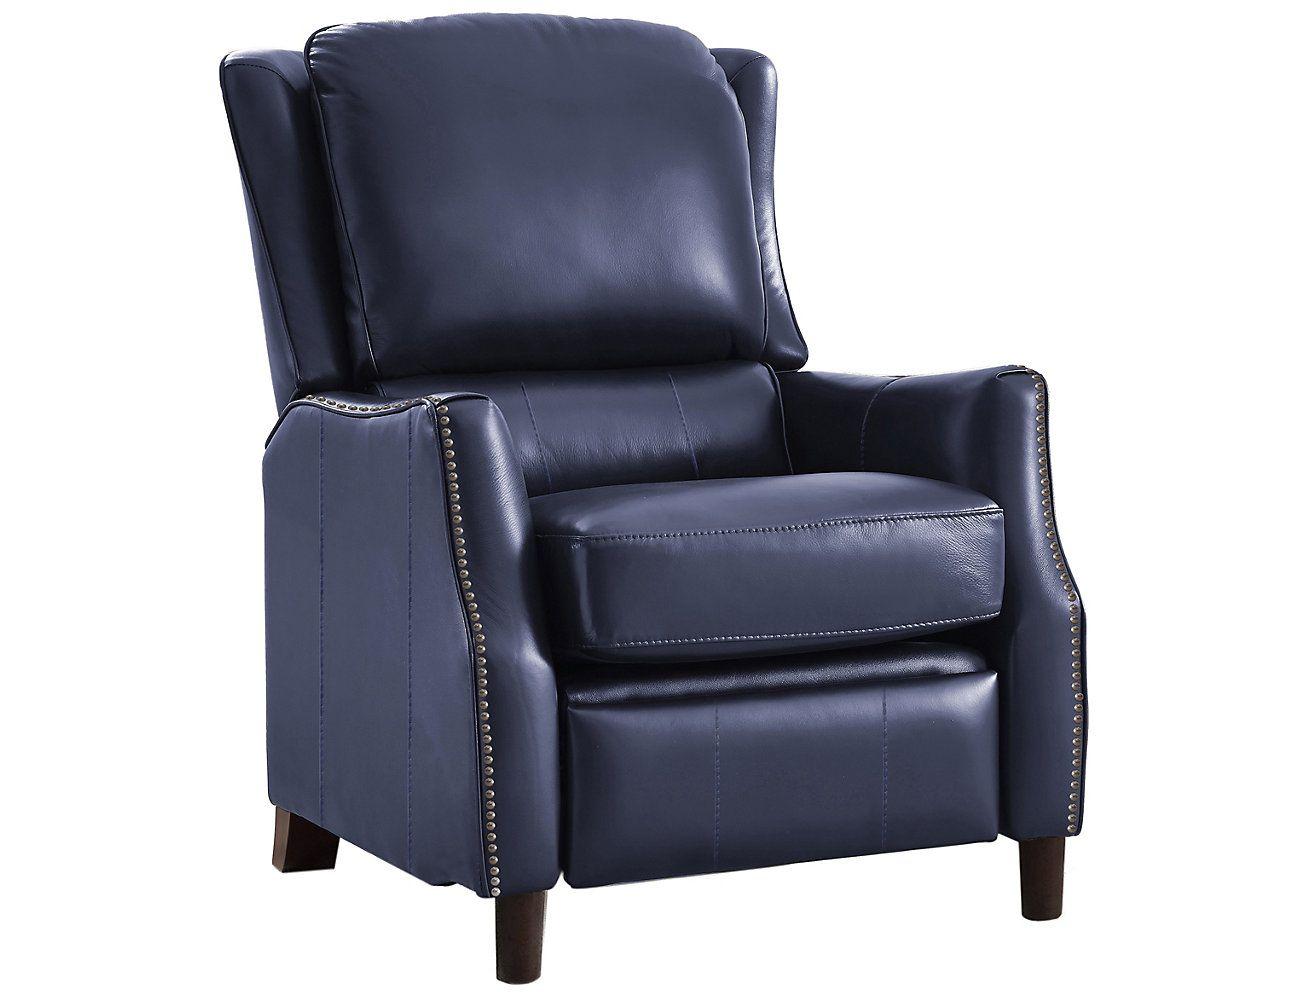 Decatur leather recliner art van home leather recliner